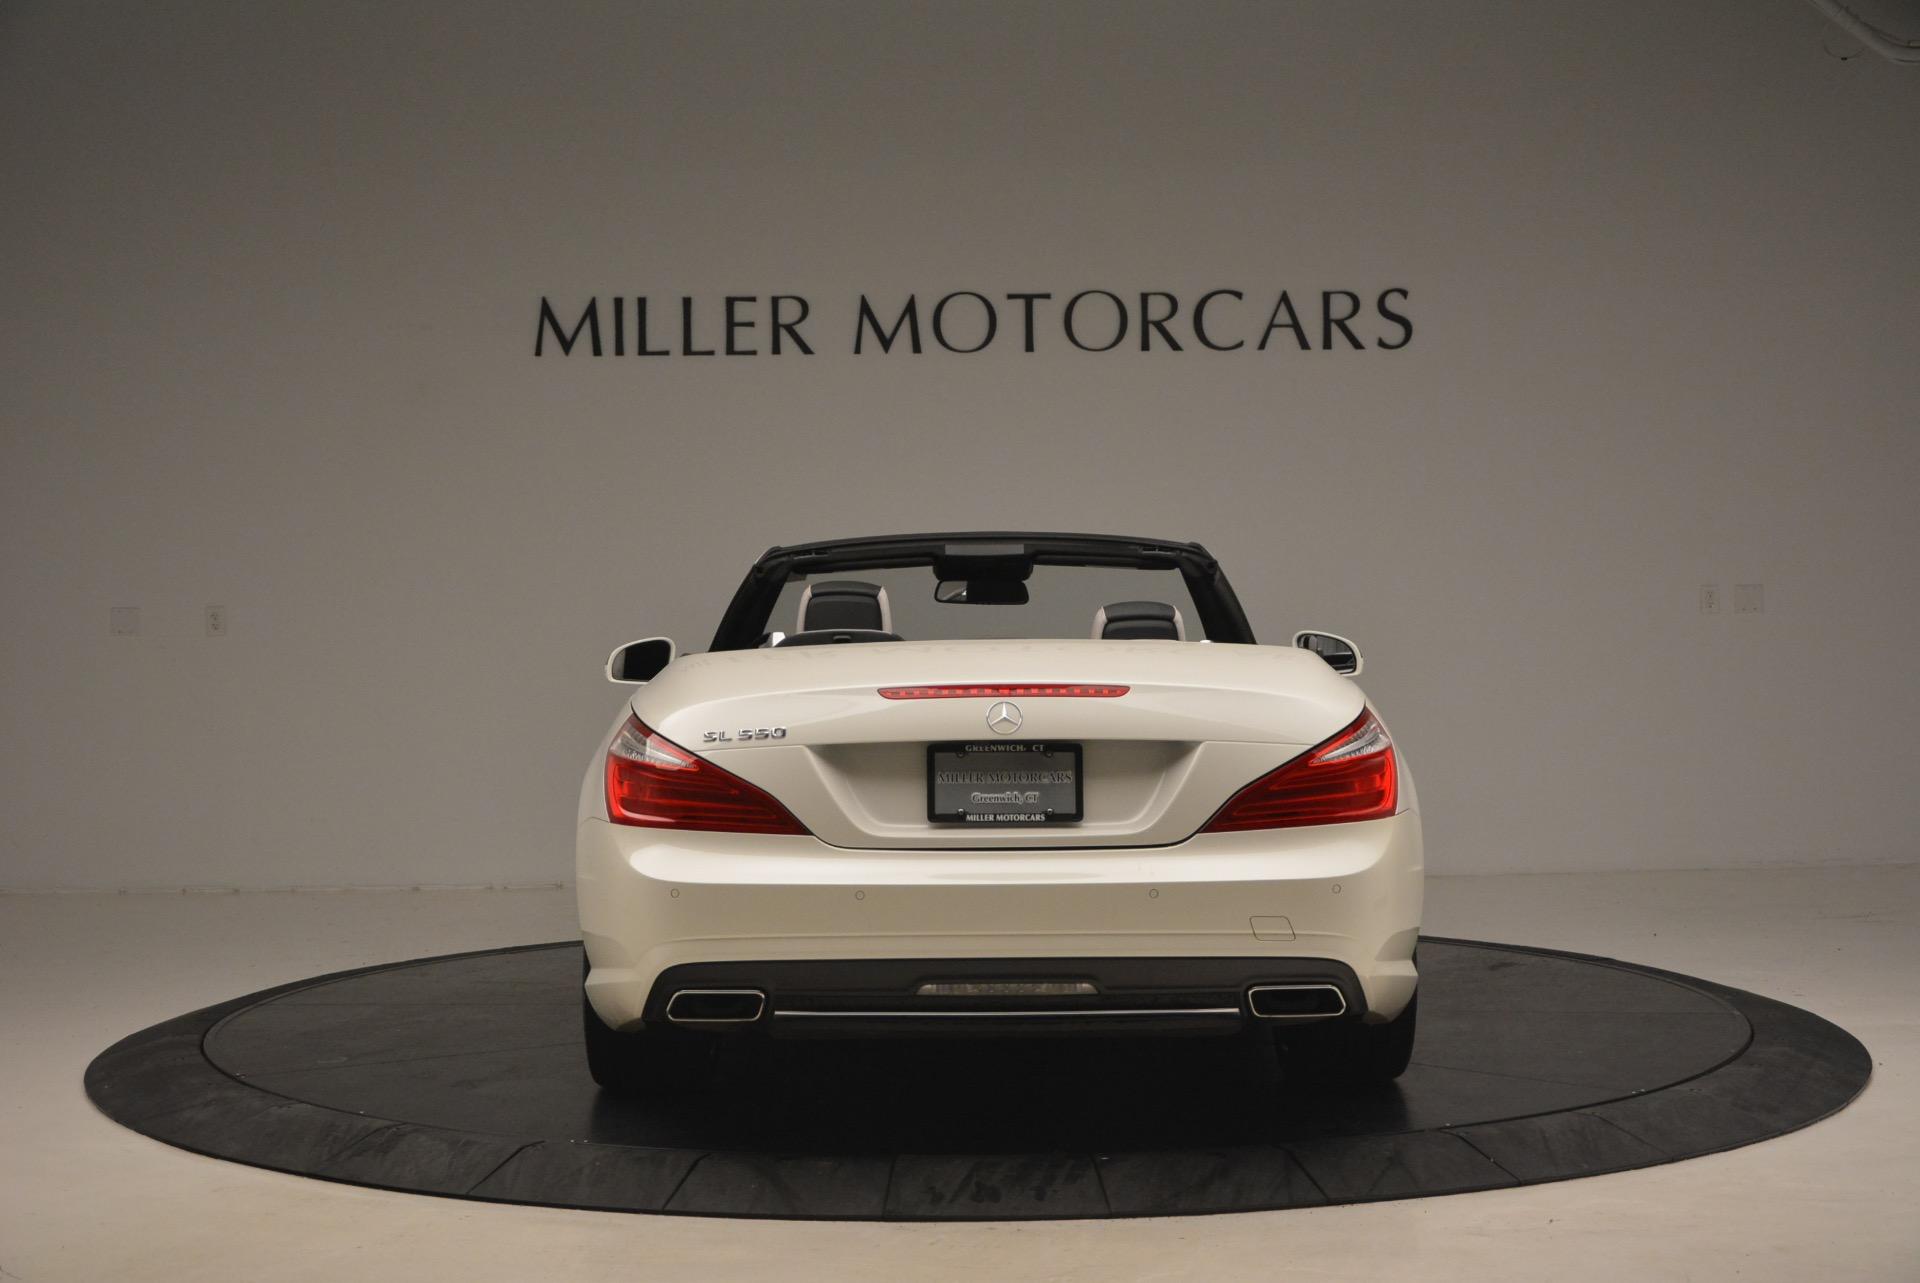 Used 2015 Mercedes Benz SL-Class SL 550 For Sale In Greenwich, CT. Alfa Romeo of Greenwich, M1874A 1261_p6